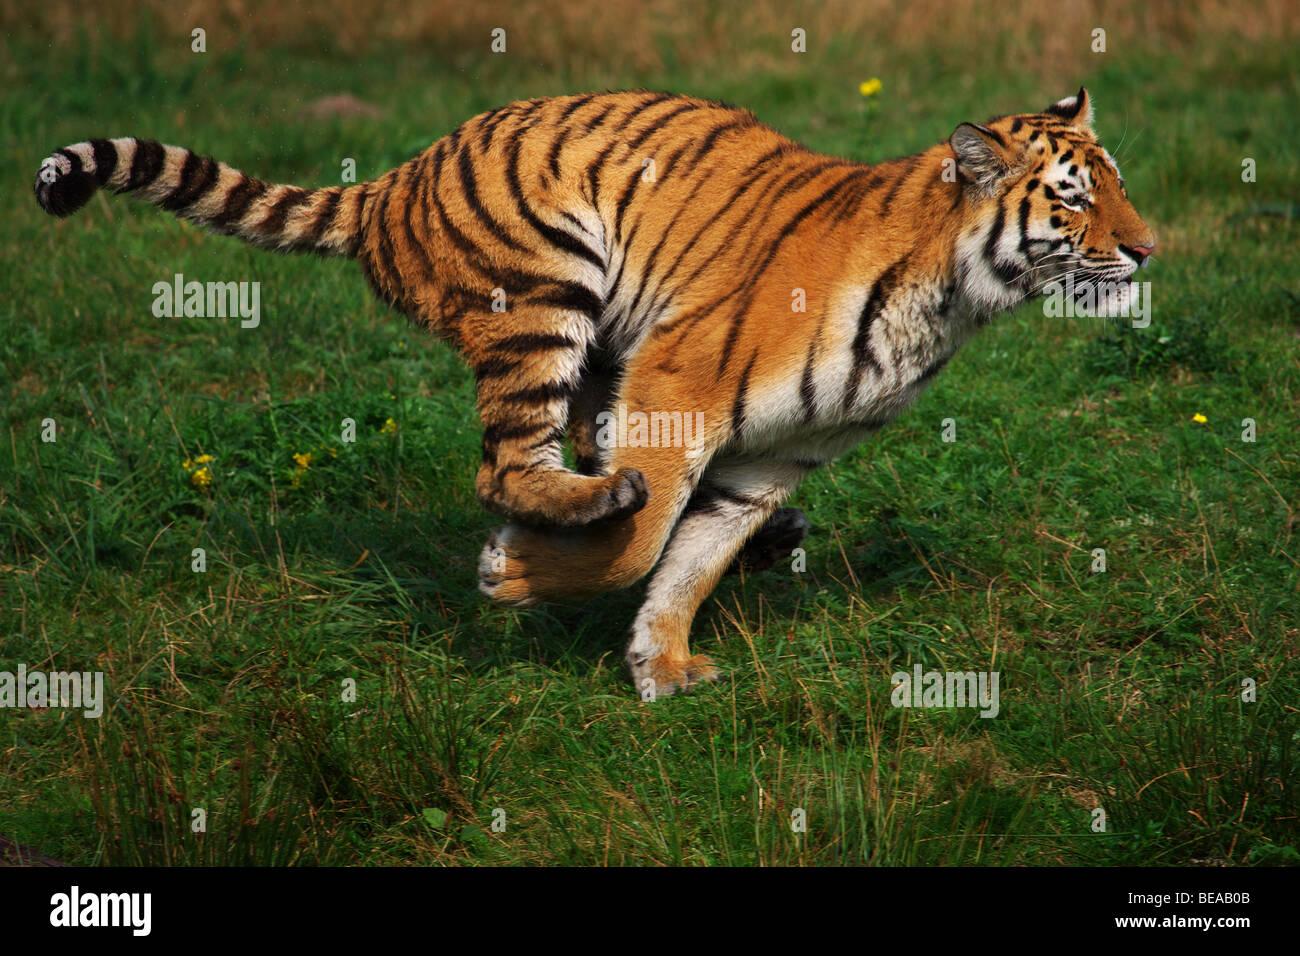 Fast running Siberian Tiger - Stock Image